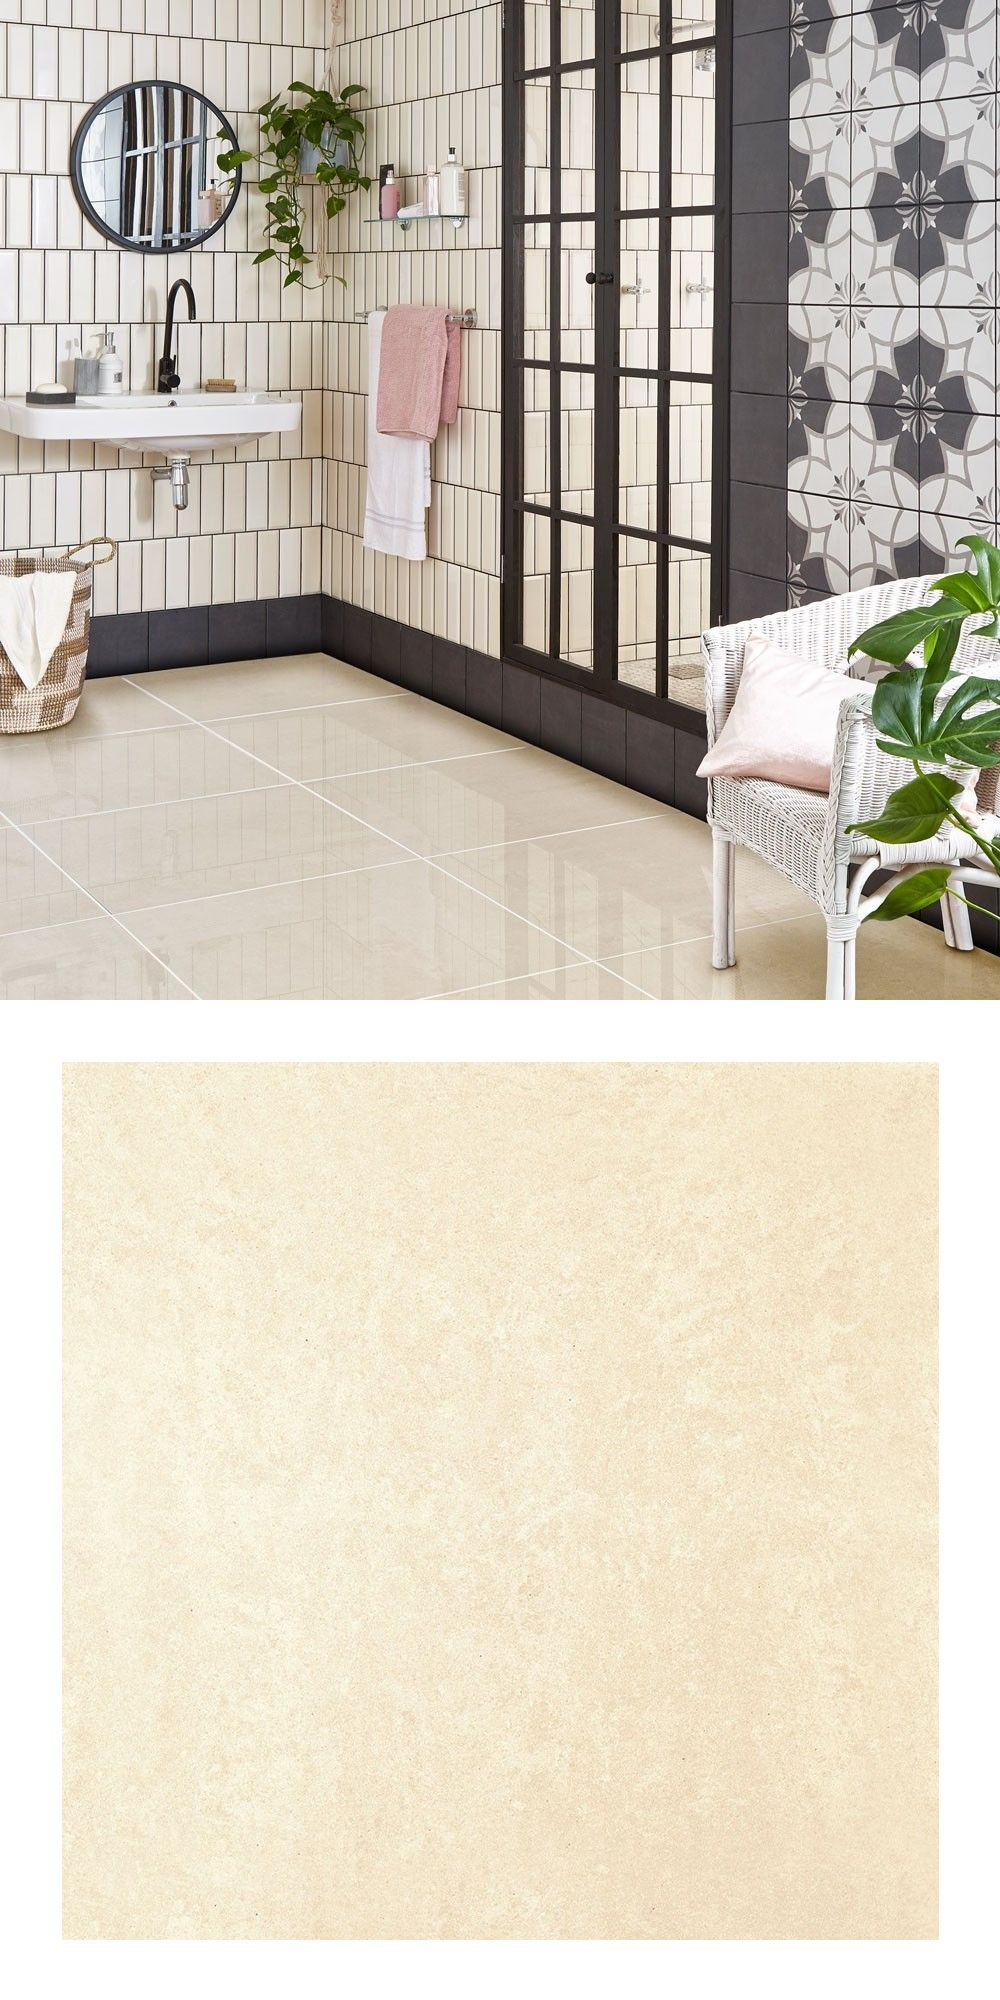 Salon Porcelain White Polished 600x600 Tiles White Tile Floor White Tiles House Tiles #porcelain #tiles #living #room